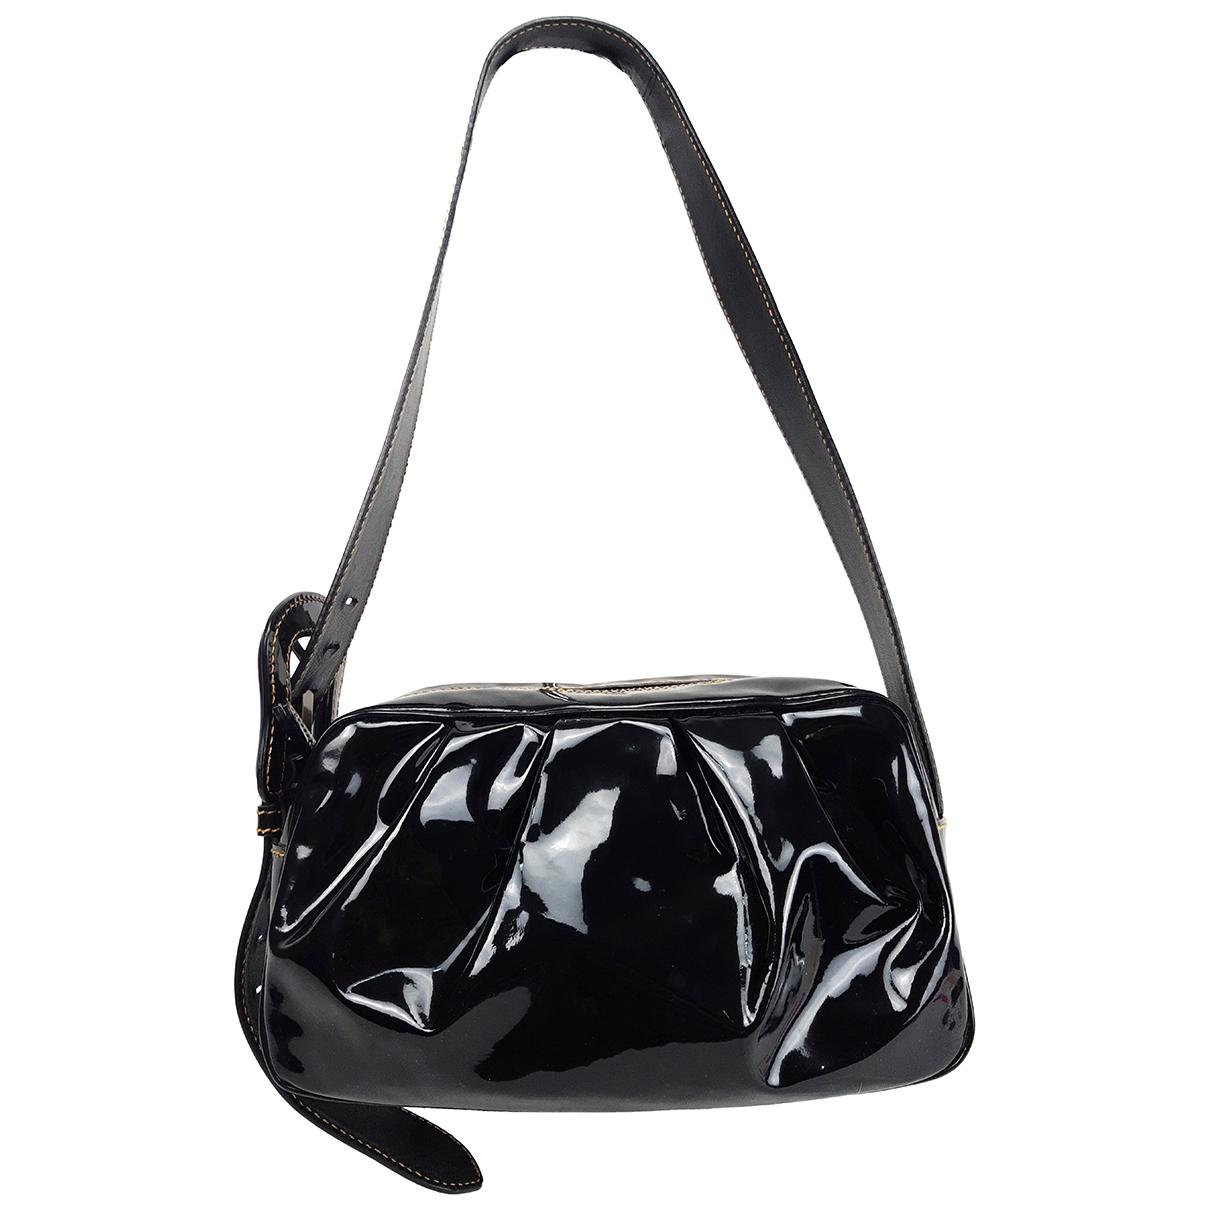 Fendi B Bag Handtasche in  Schwarz Lackleder